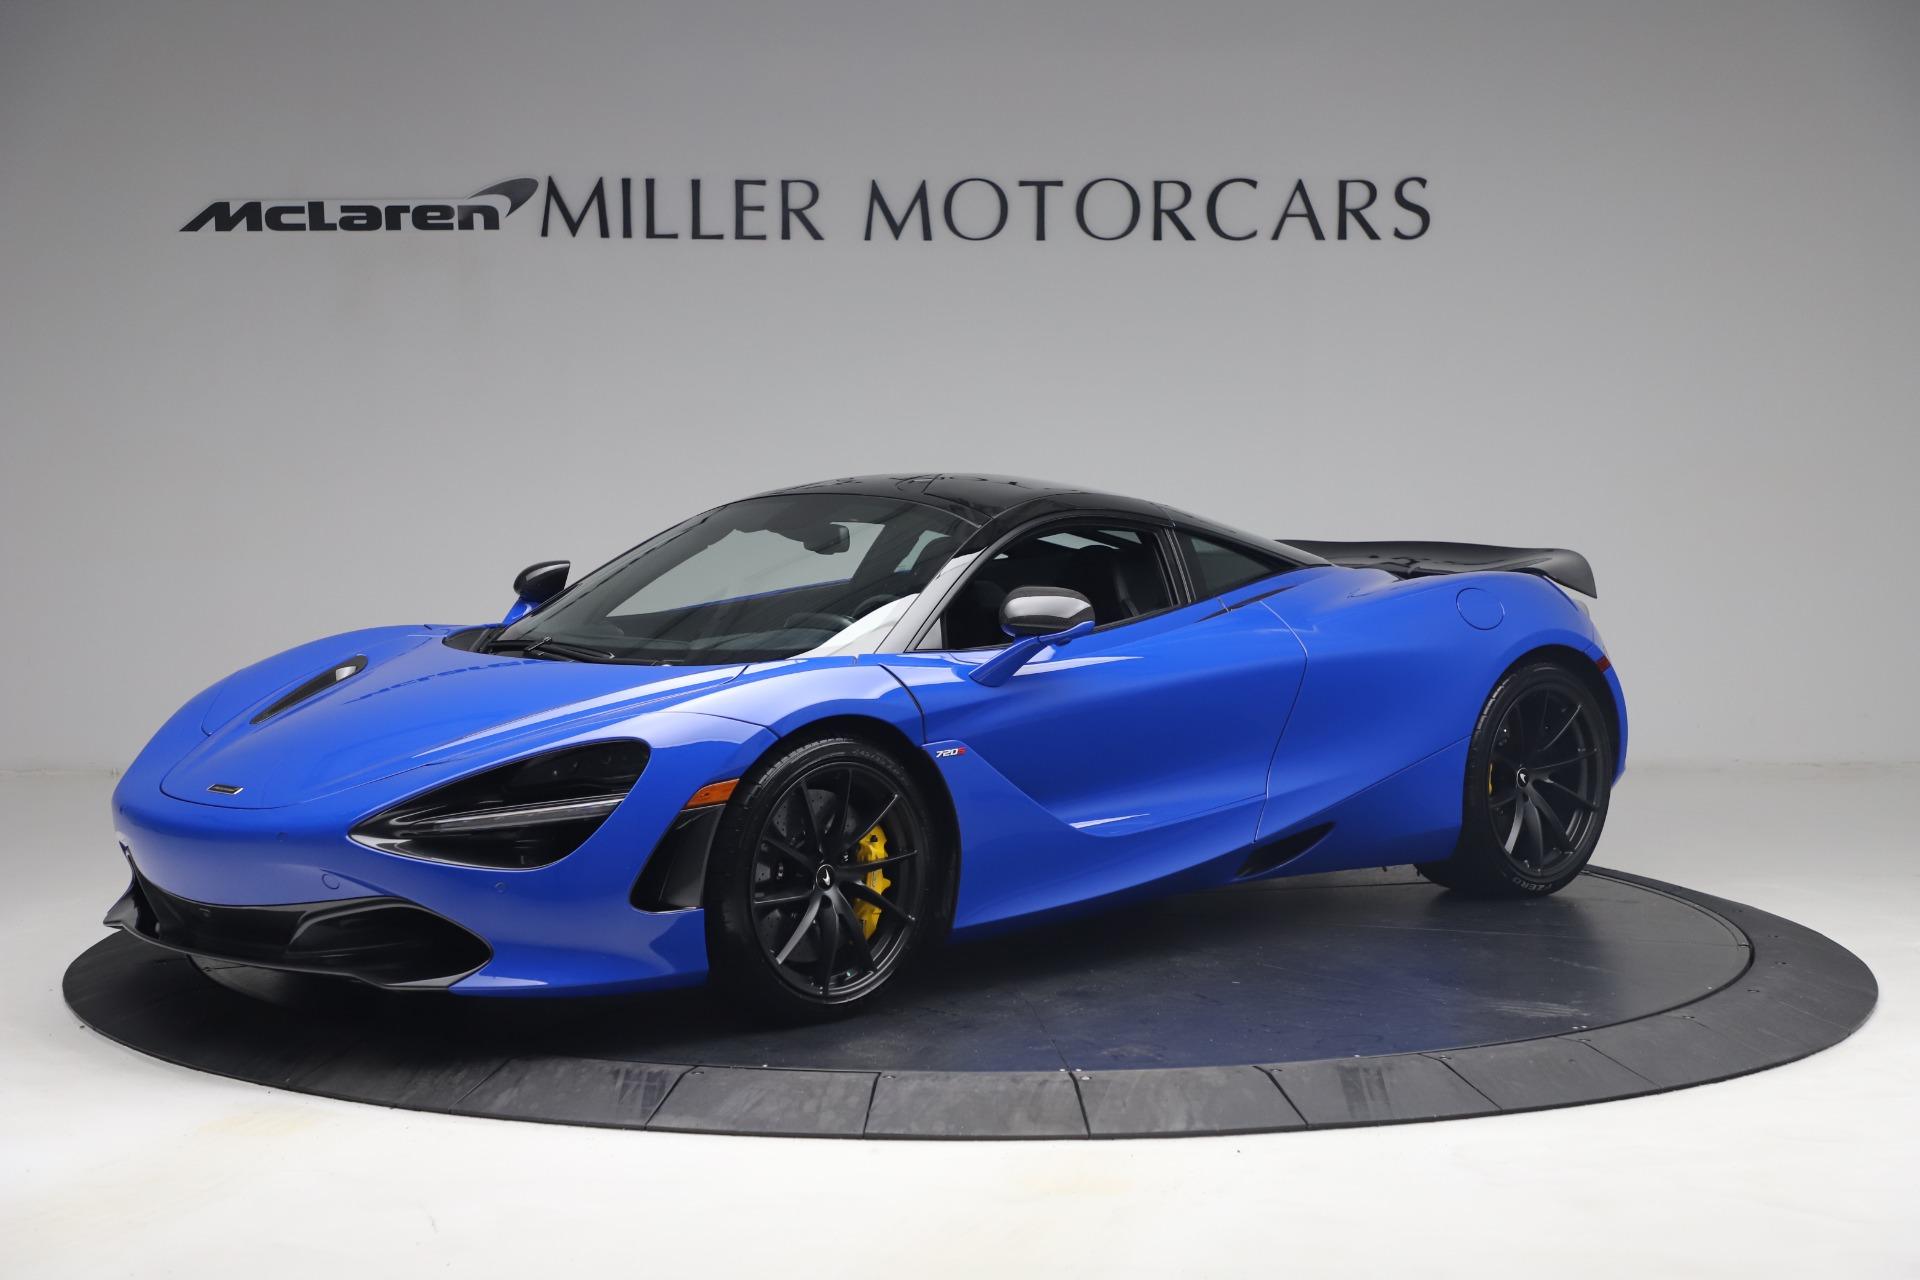 Used 2020 McLaren 720S Performance for sale $334,990 at Maserati of Westport in Westport CT 06880 1